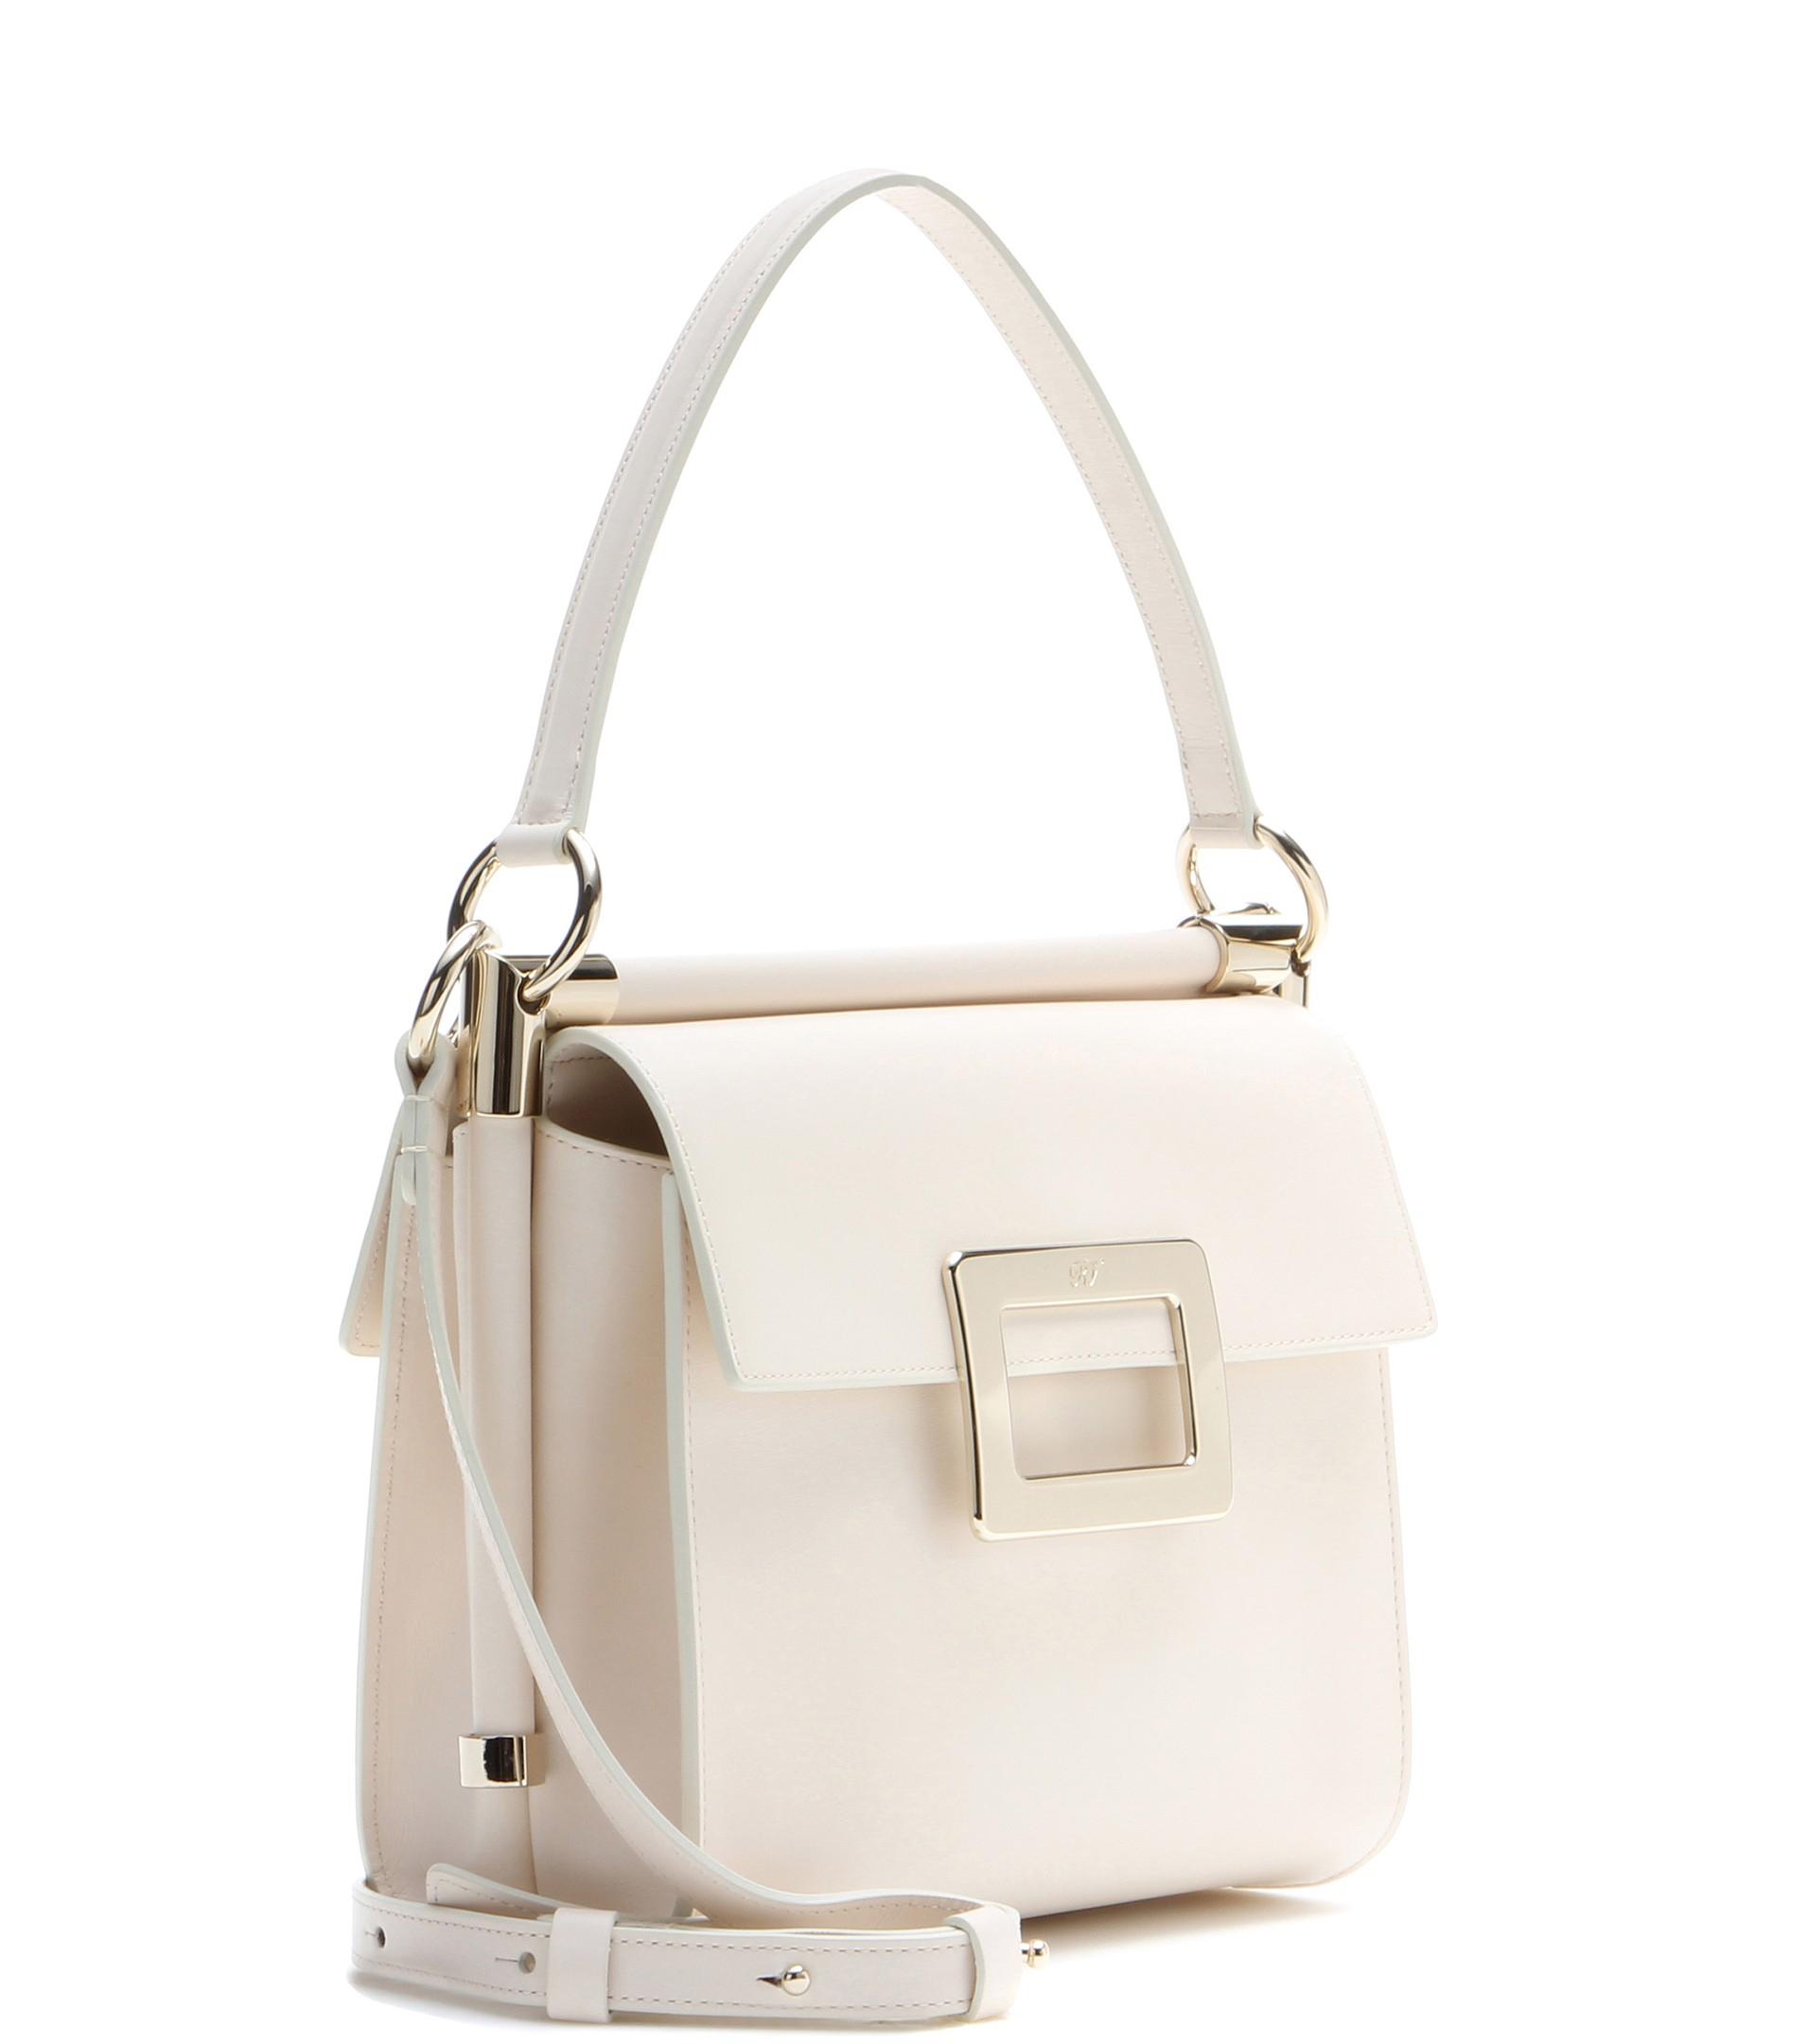 53b9fdcfb8 Lyst - Roger Vivier Miss Viv  Carré Small Leather Shoulder Bag in ...